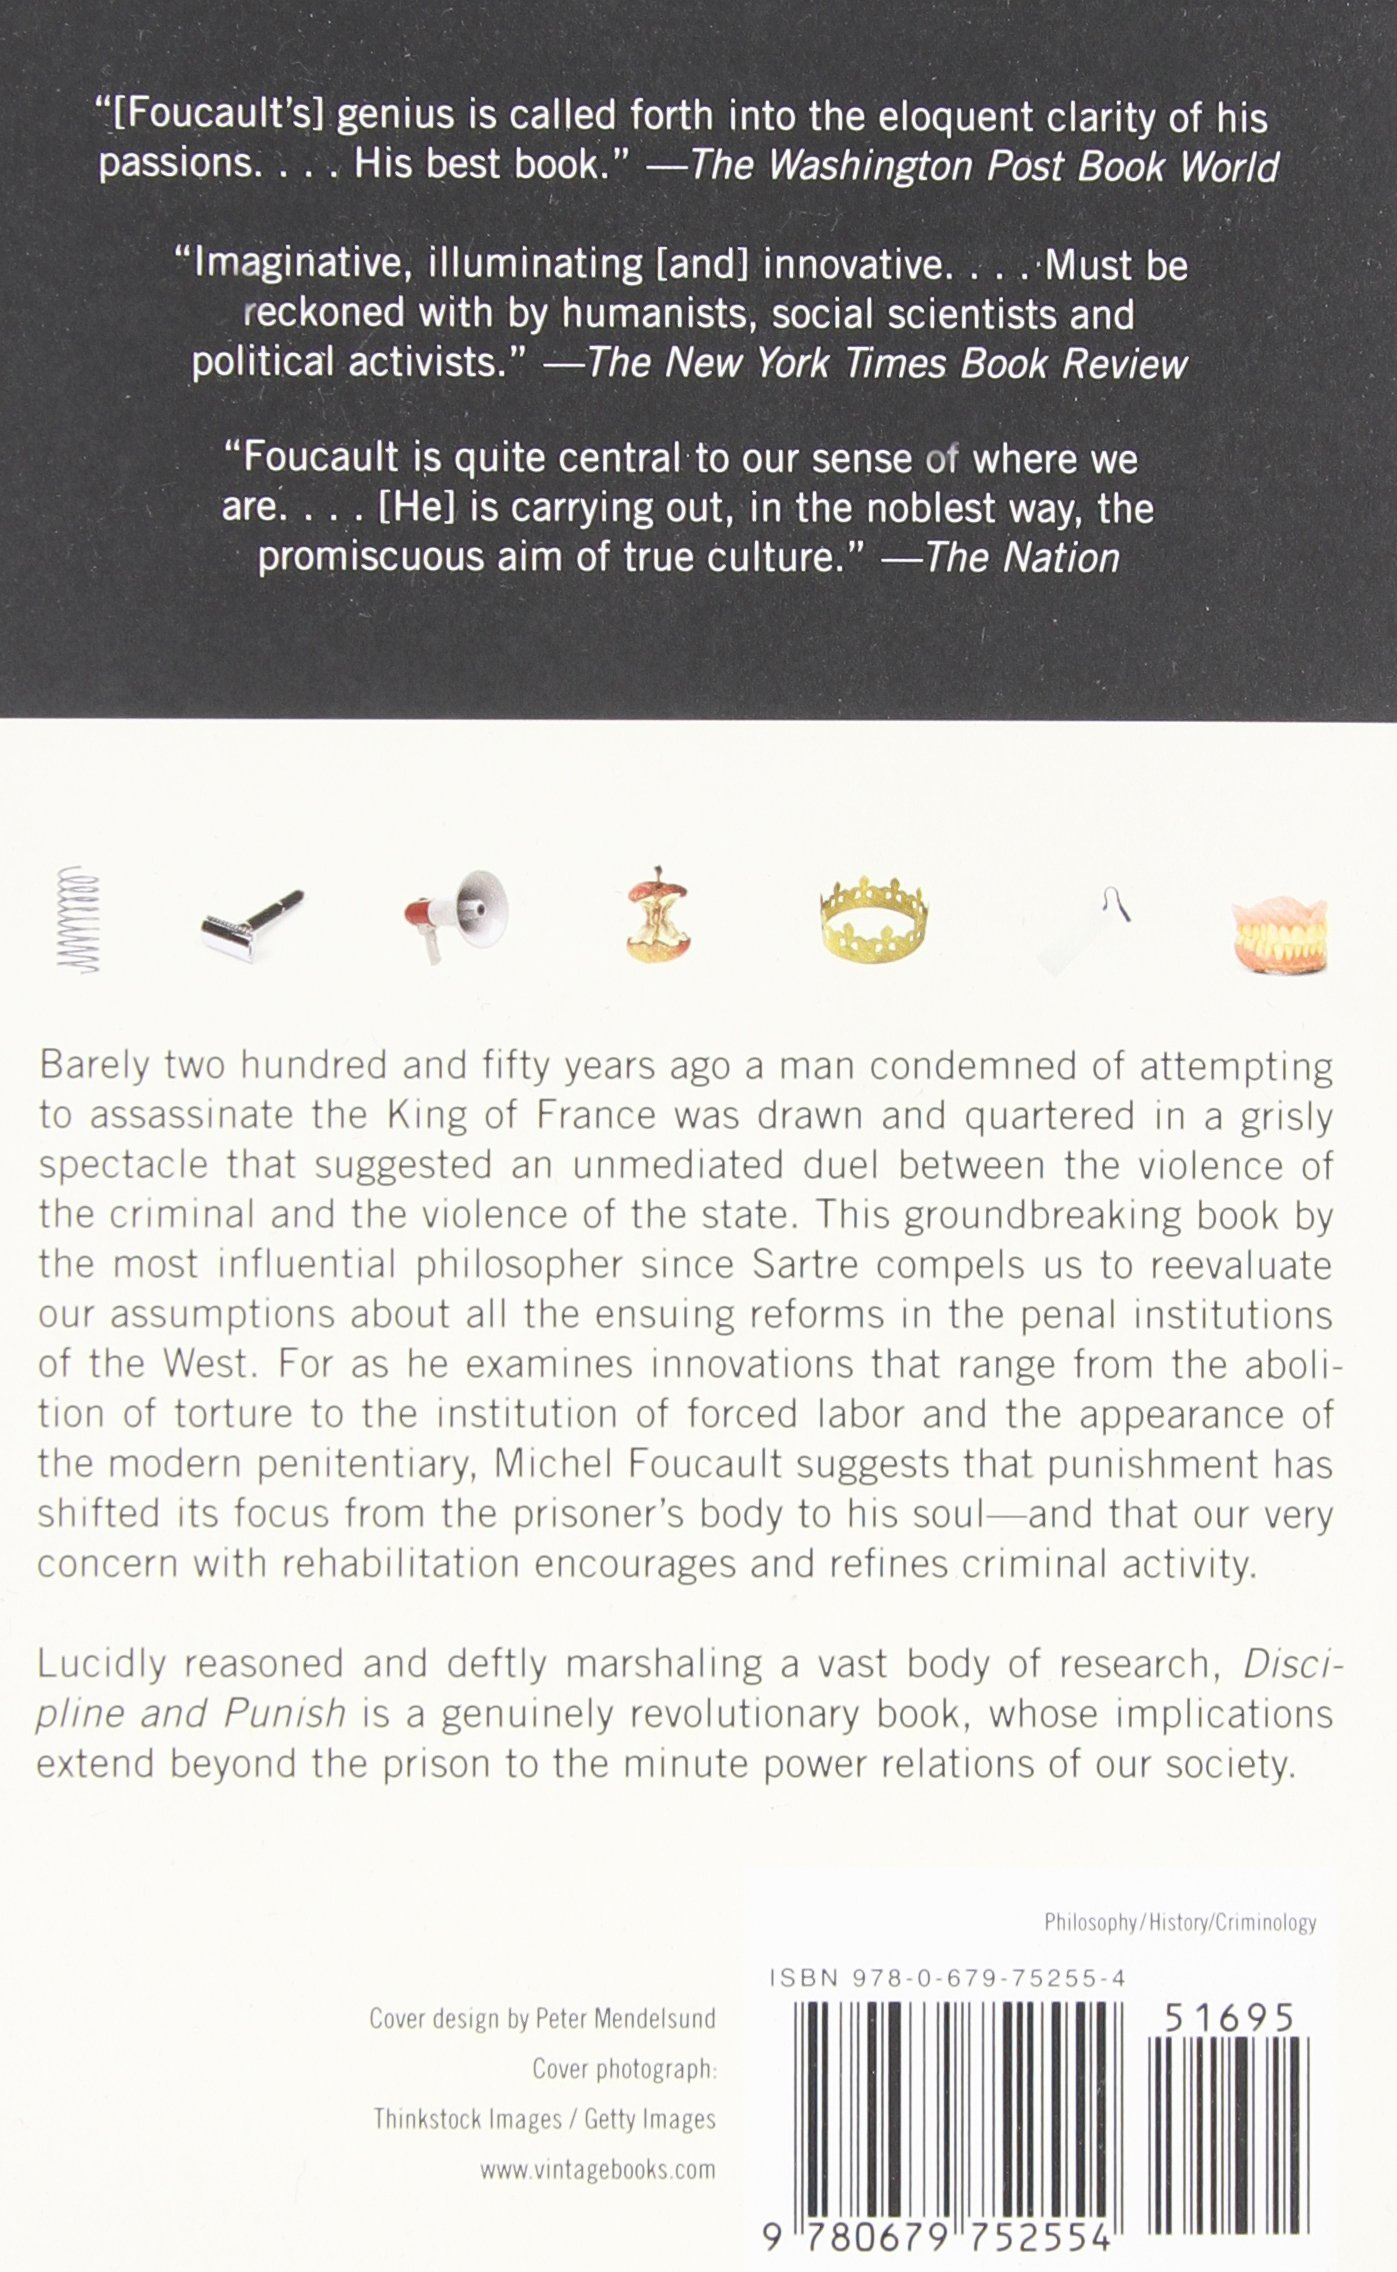 All My Sons Essay Discipline  Punish The Birth Of The Prison Michel Foucault Alan  Sheridan  Amazoncom Books Julius Caesar Tragic Hero Essay also Essays Meaning Discipline  Punish The Birth Of The Prison Michel Foucault Alan  1984 Essay